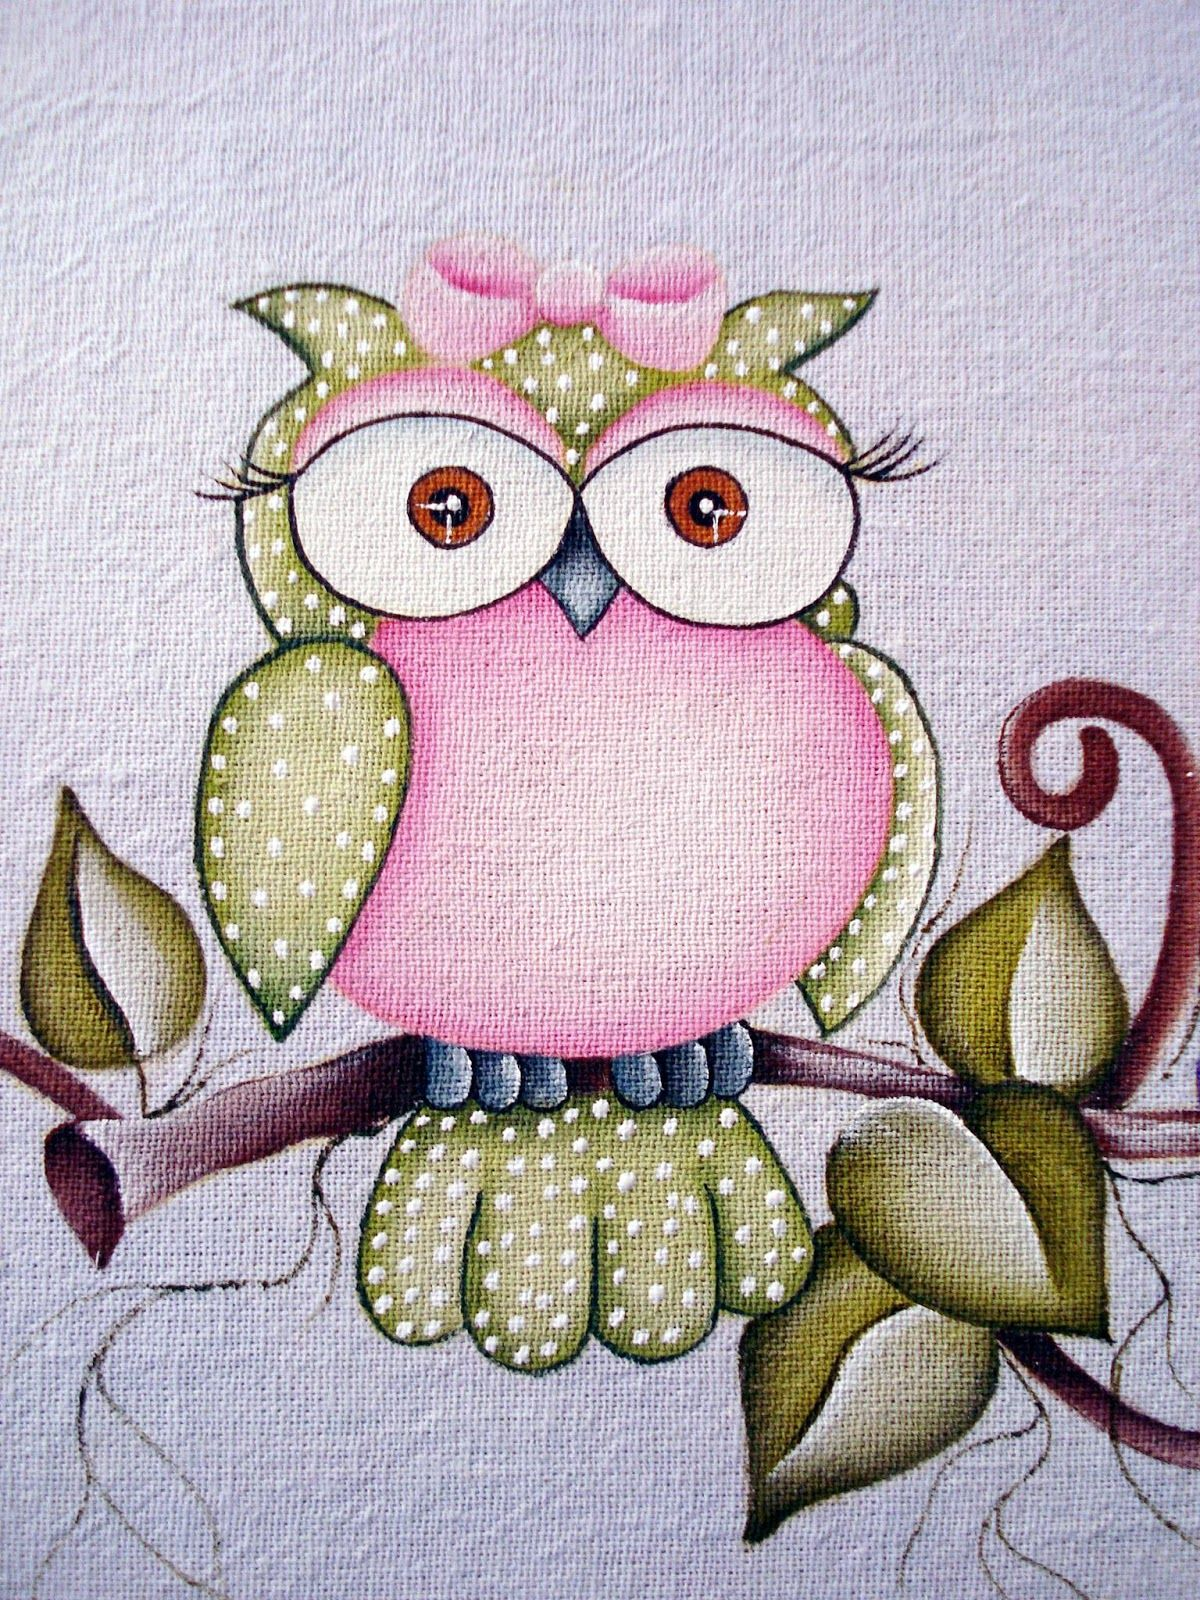 M o amiga agosto 2013 dibujos lindos pinturas en - Dibujos para pintar en tela infantiles ...